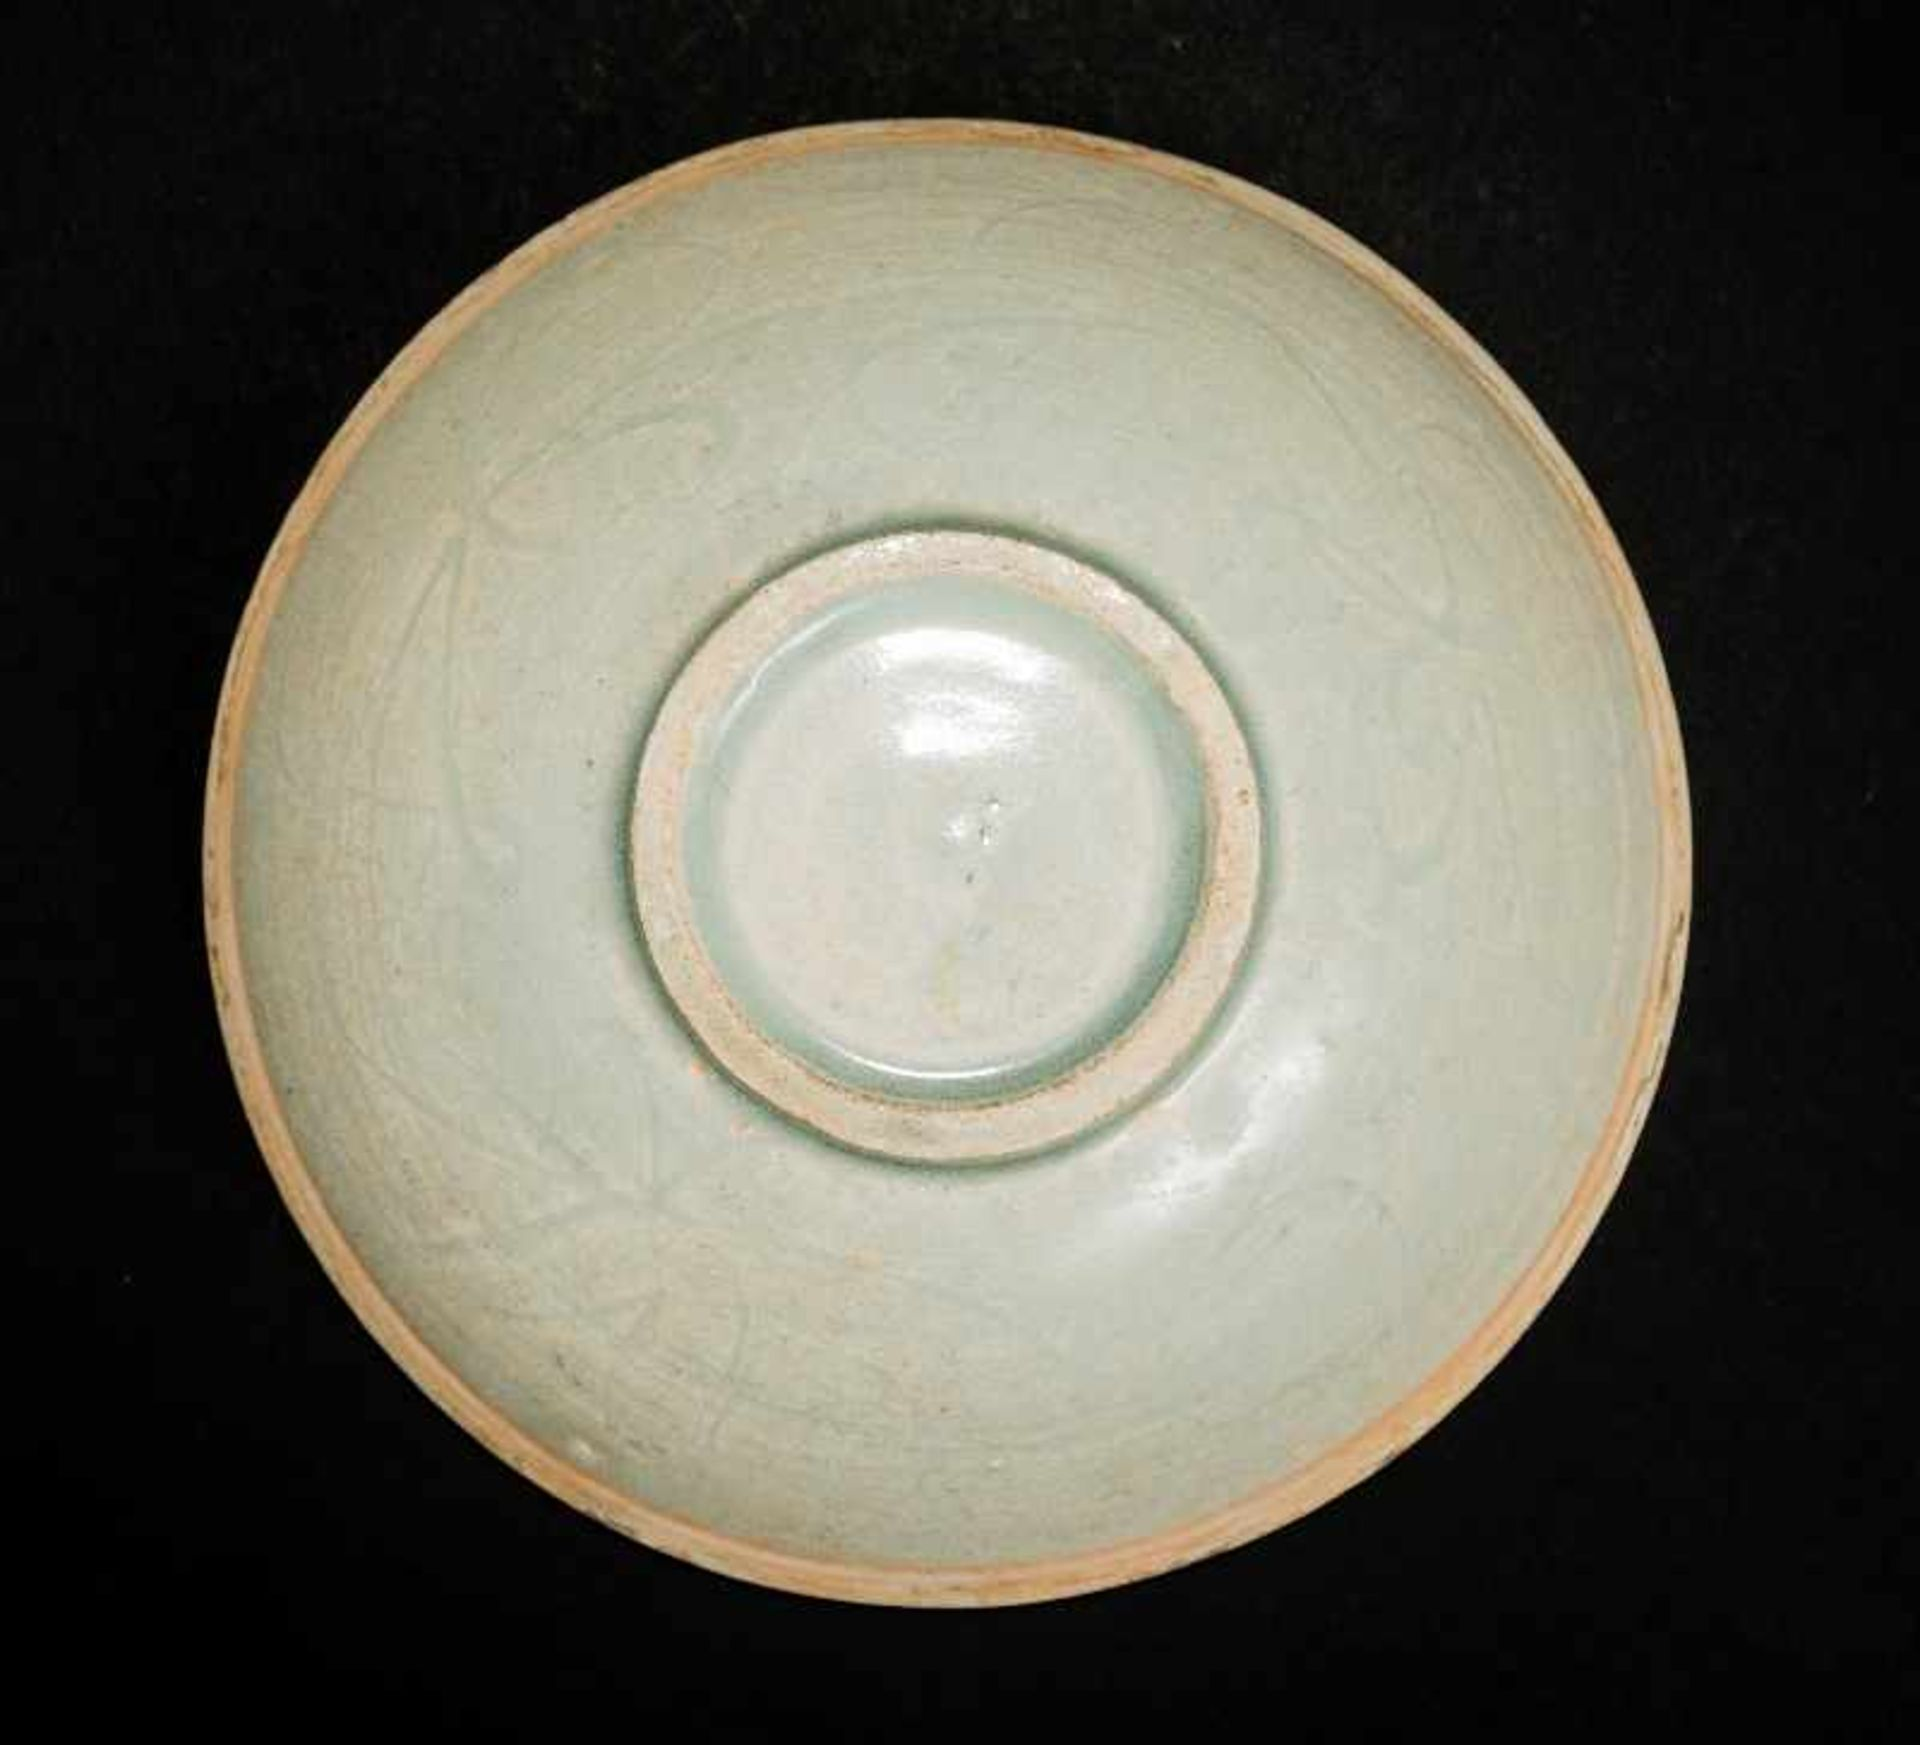 TIEFE SCHALE MIT QINGBAI-GLASURProto-Porzellan. China, Song bis Yuan, ca. 12. bis 13. Jh. Ein - Image 3 of 4